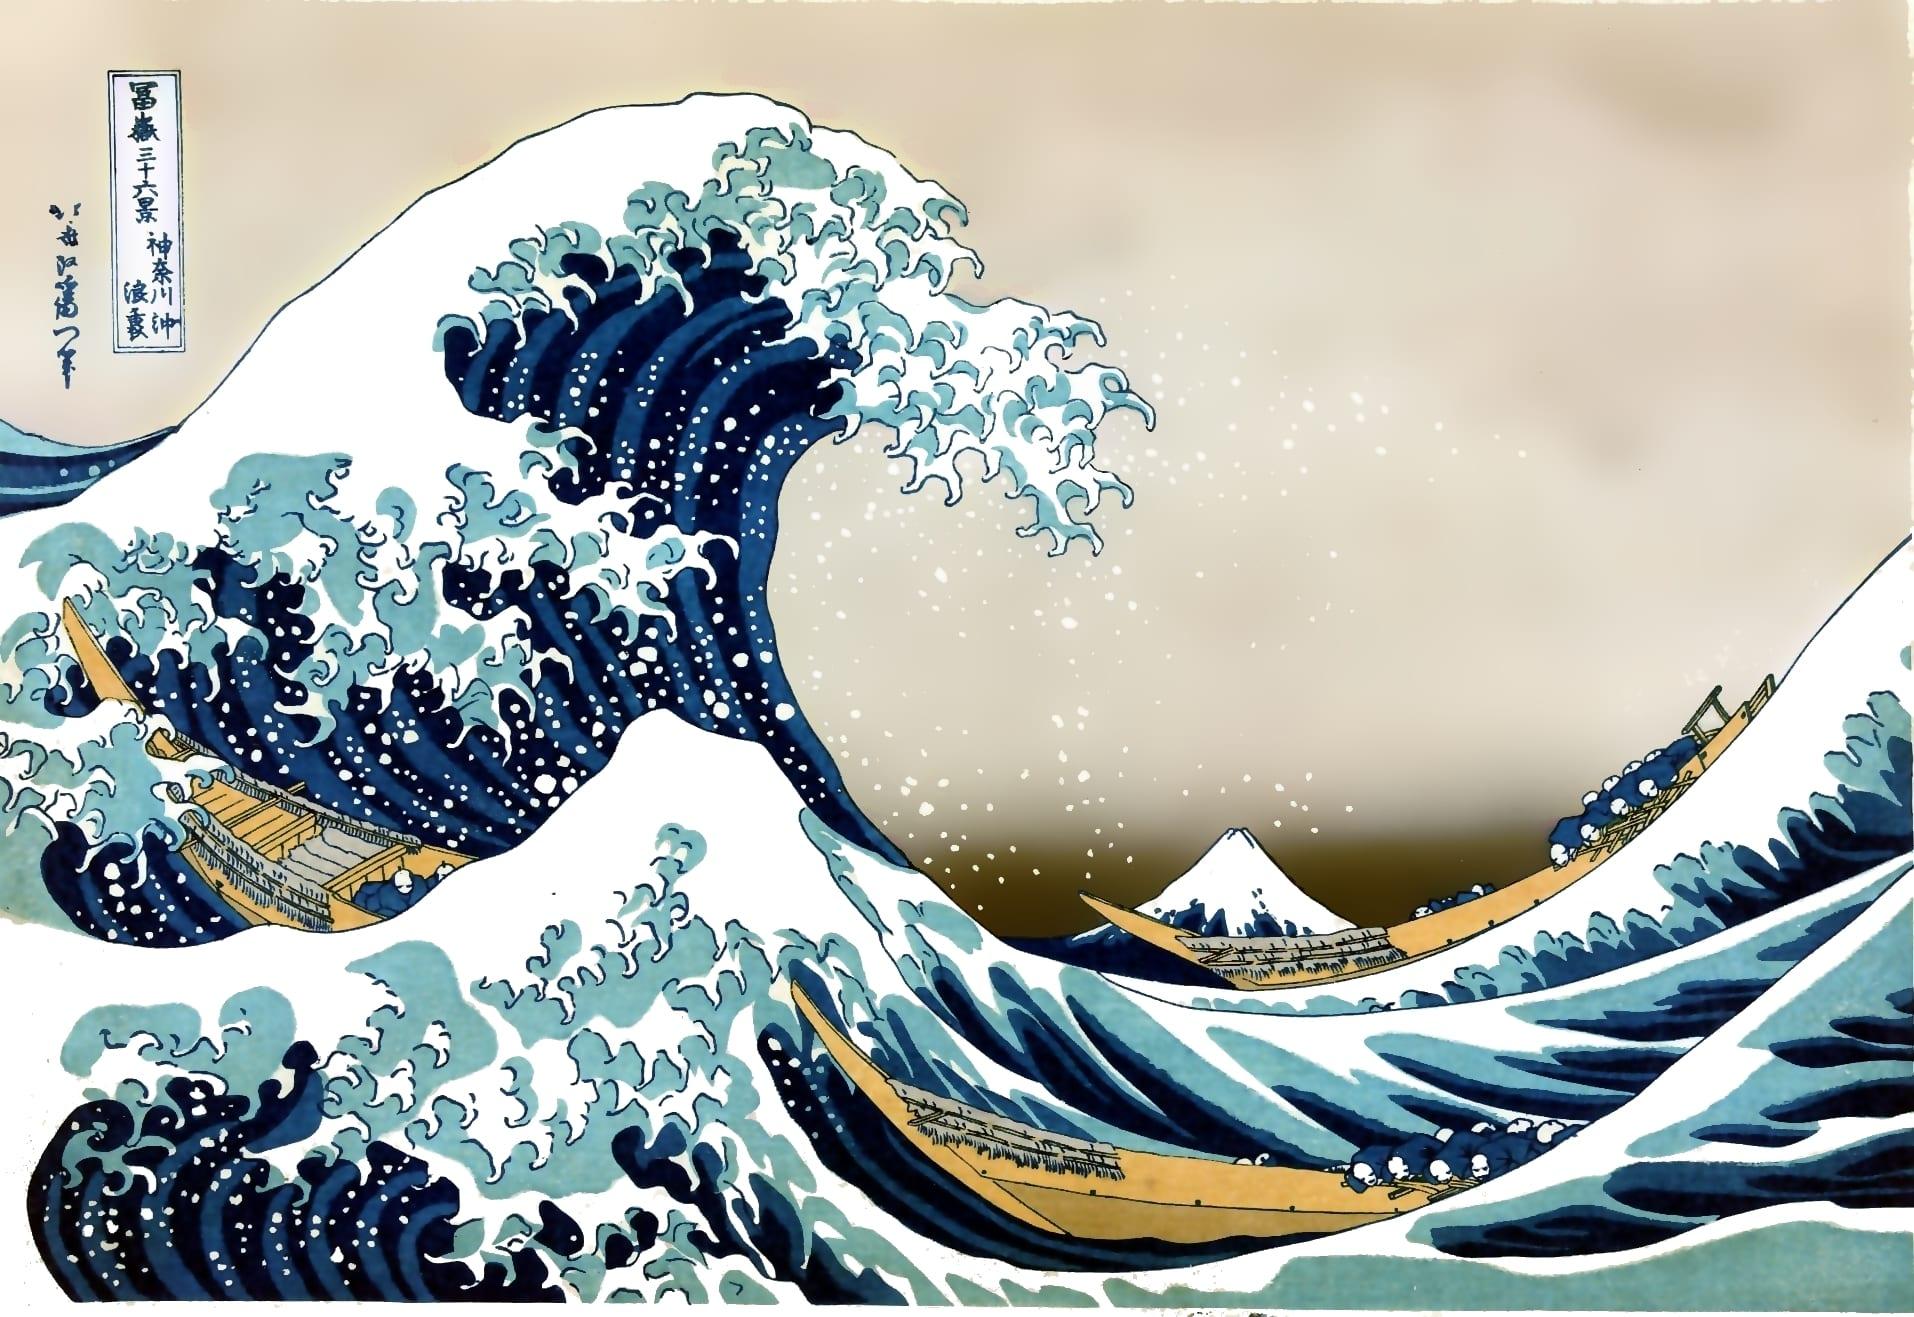 Hokusai The Great Wave at Kanagawa, Manggha Museum of Japanese Art and Technology